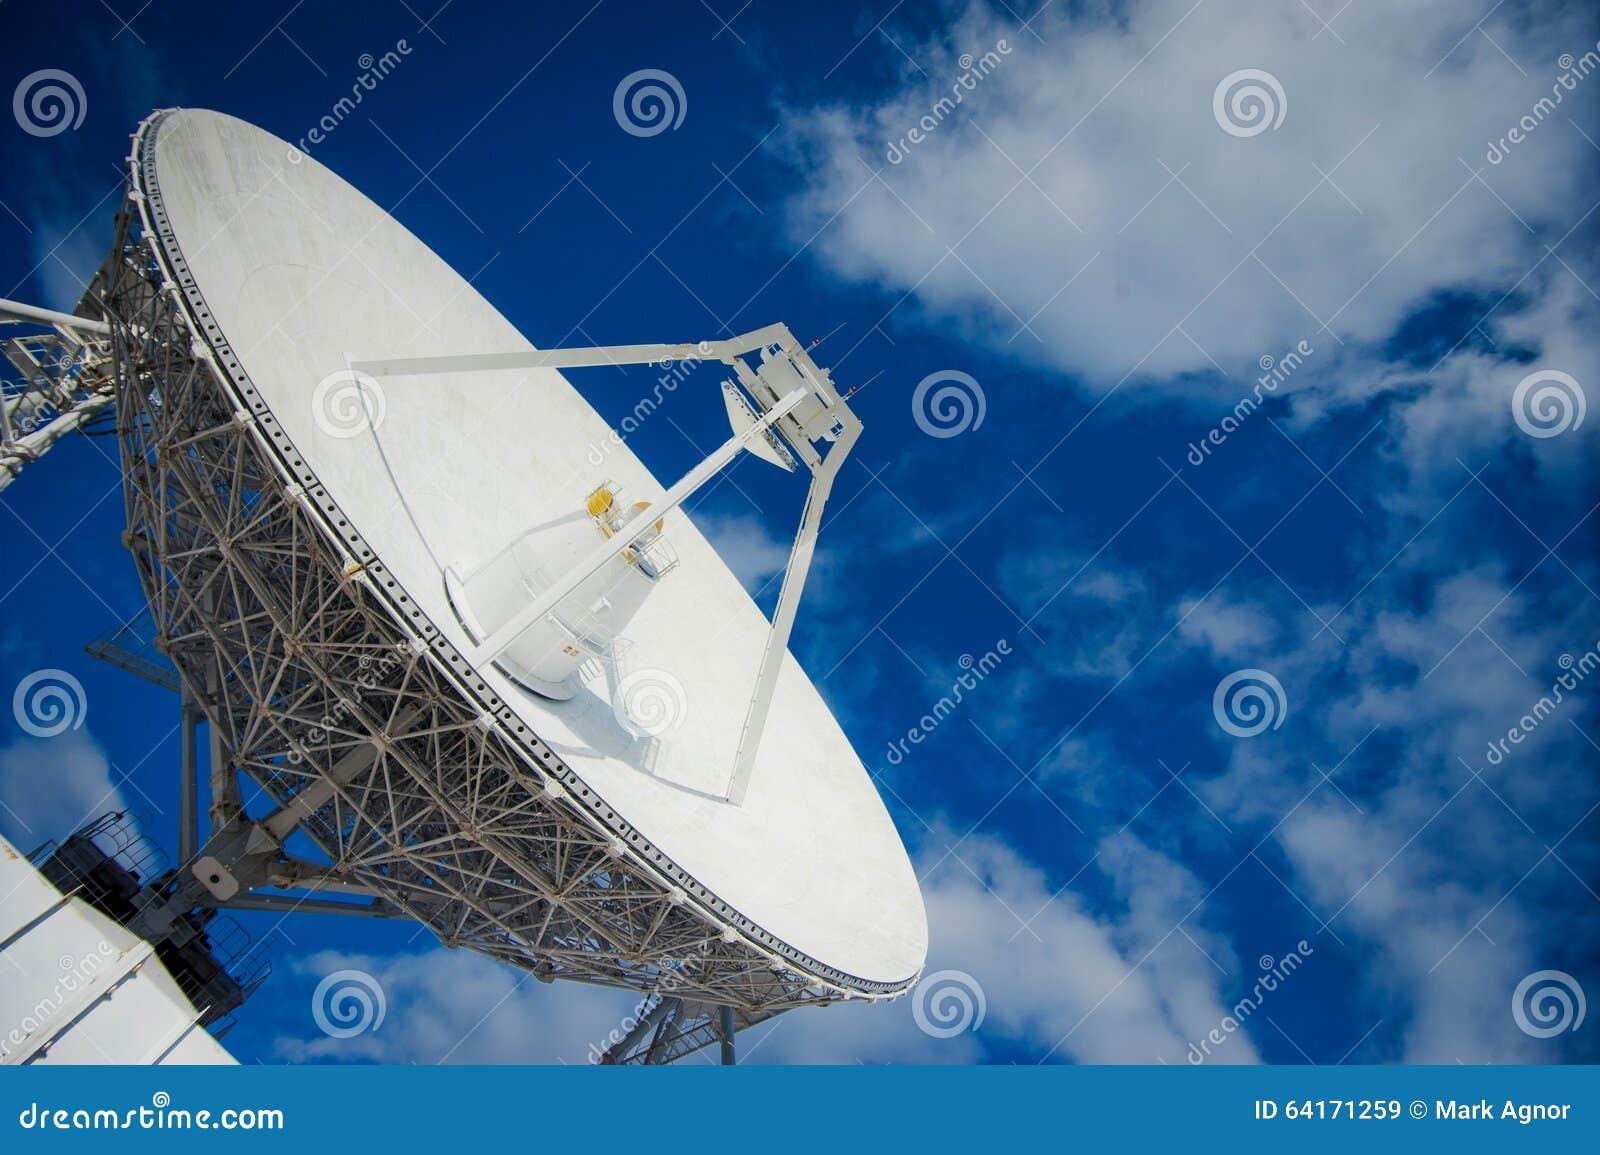 Huge Radio Antenna With Big Diameter Editorial Stock Image